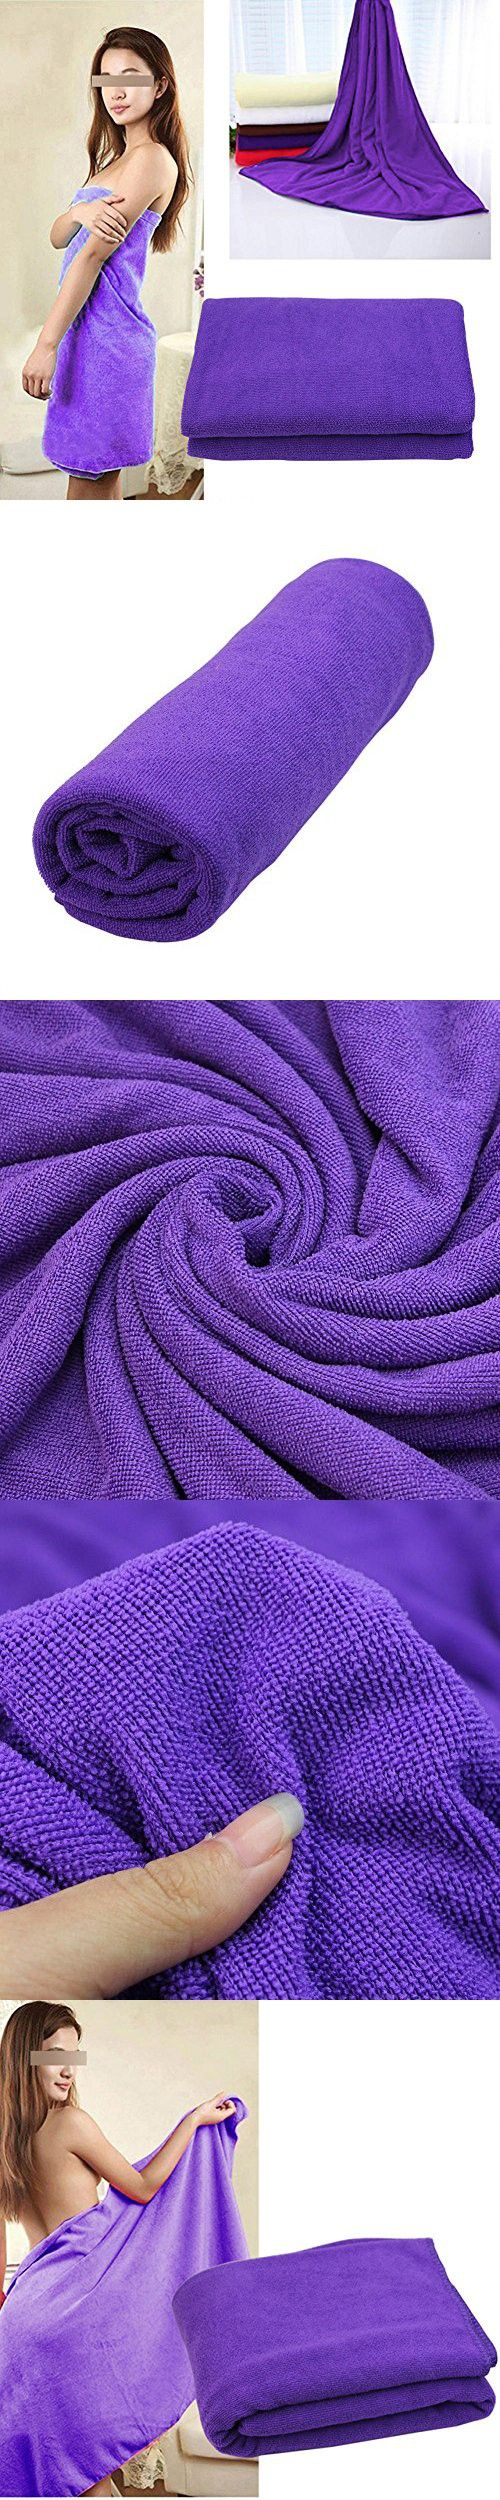 Luxury Purple Microfiber Bath Towel Fast Drying Fitness Beach Swim Camping Hot 140X70Cm